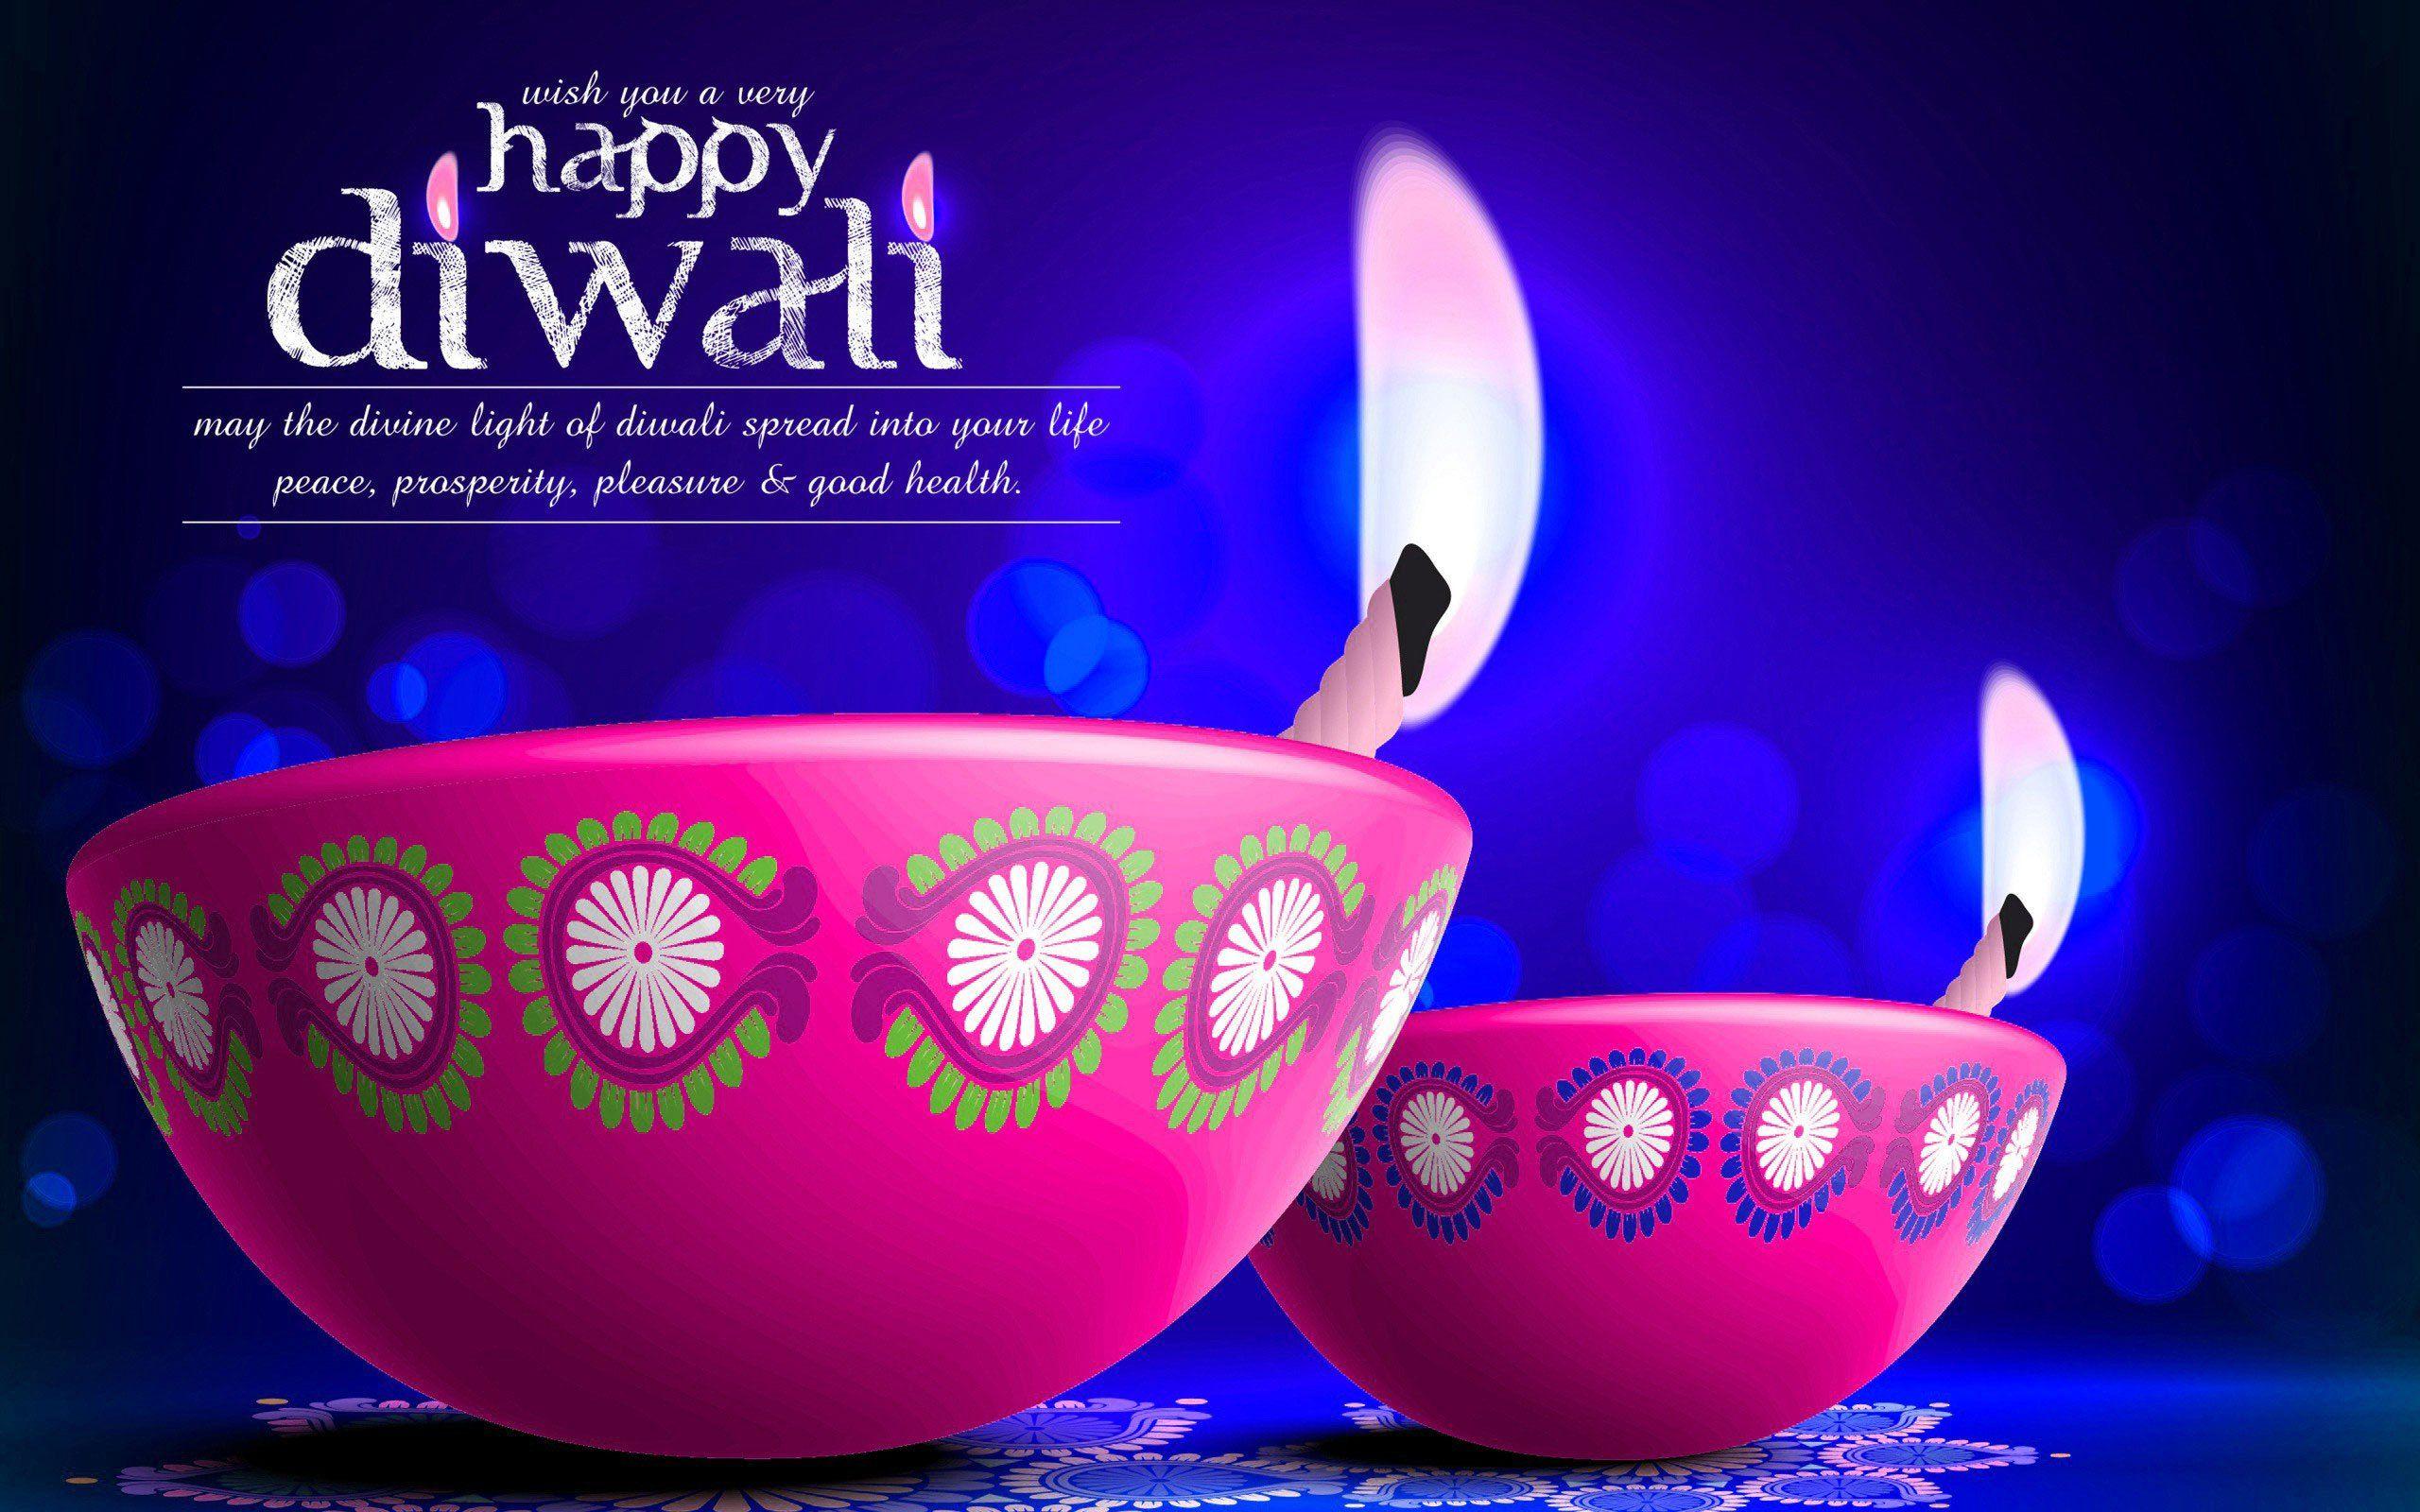 Good Looking_happy Diwali Wallpaper Hd Widescreen